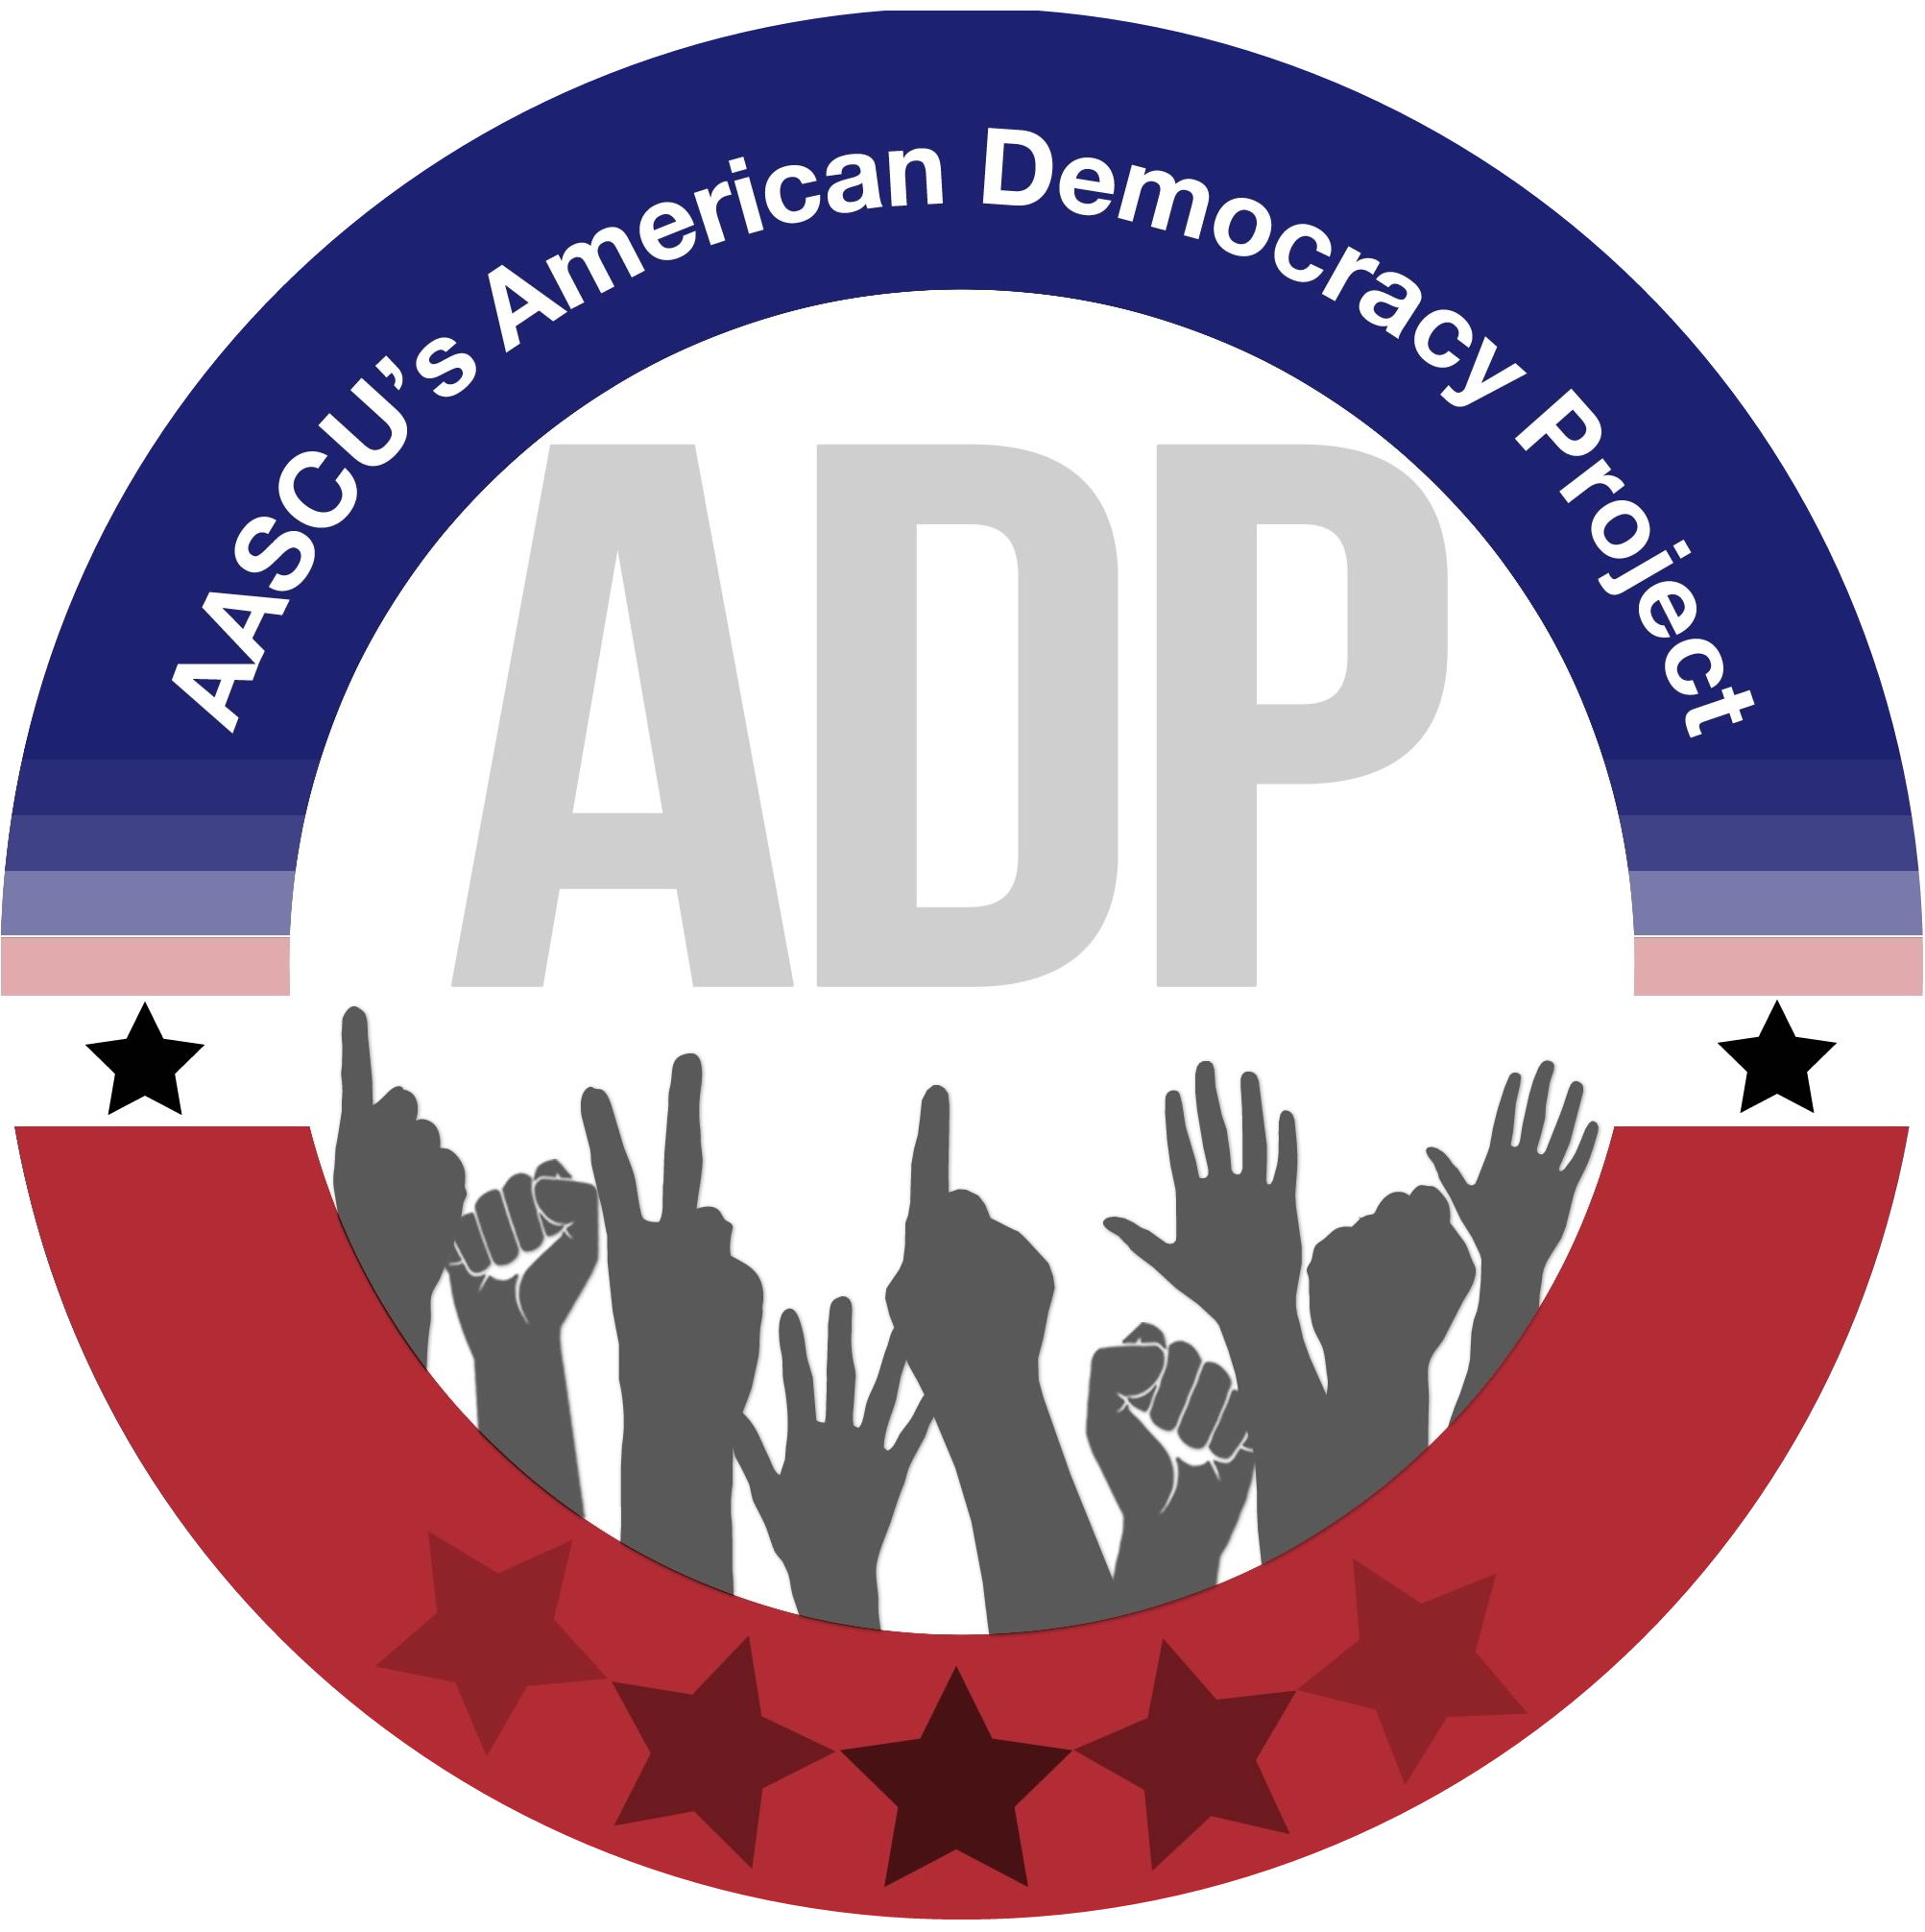 svg transparent download American Democracy Project at UW Oshkosh